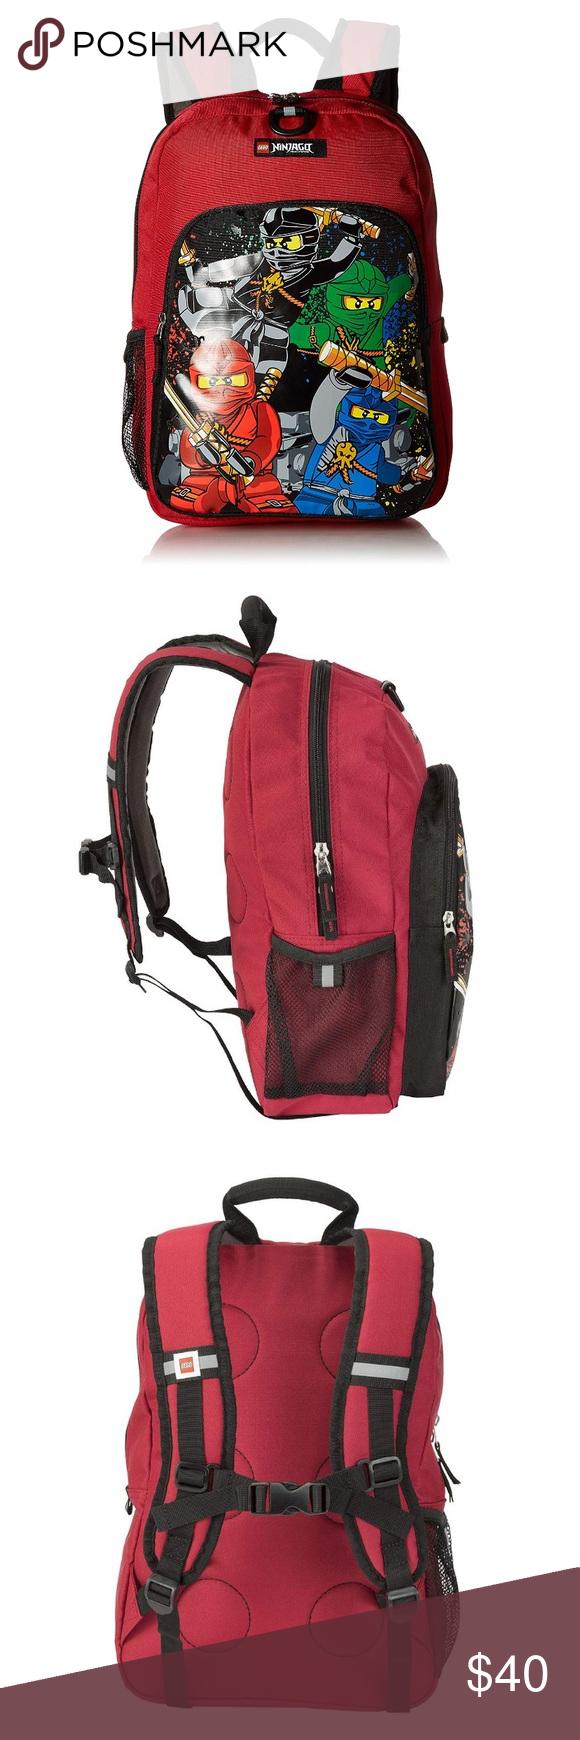 5dde58bf41 LEGO Kids Ninjago Team Heritage Classic Backpack • Ergonomically padded